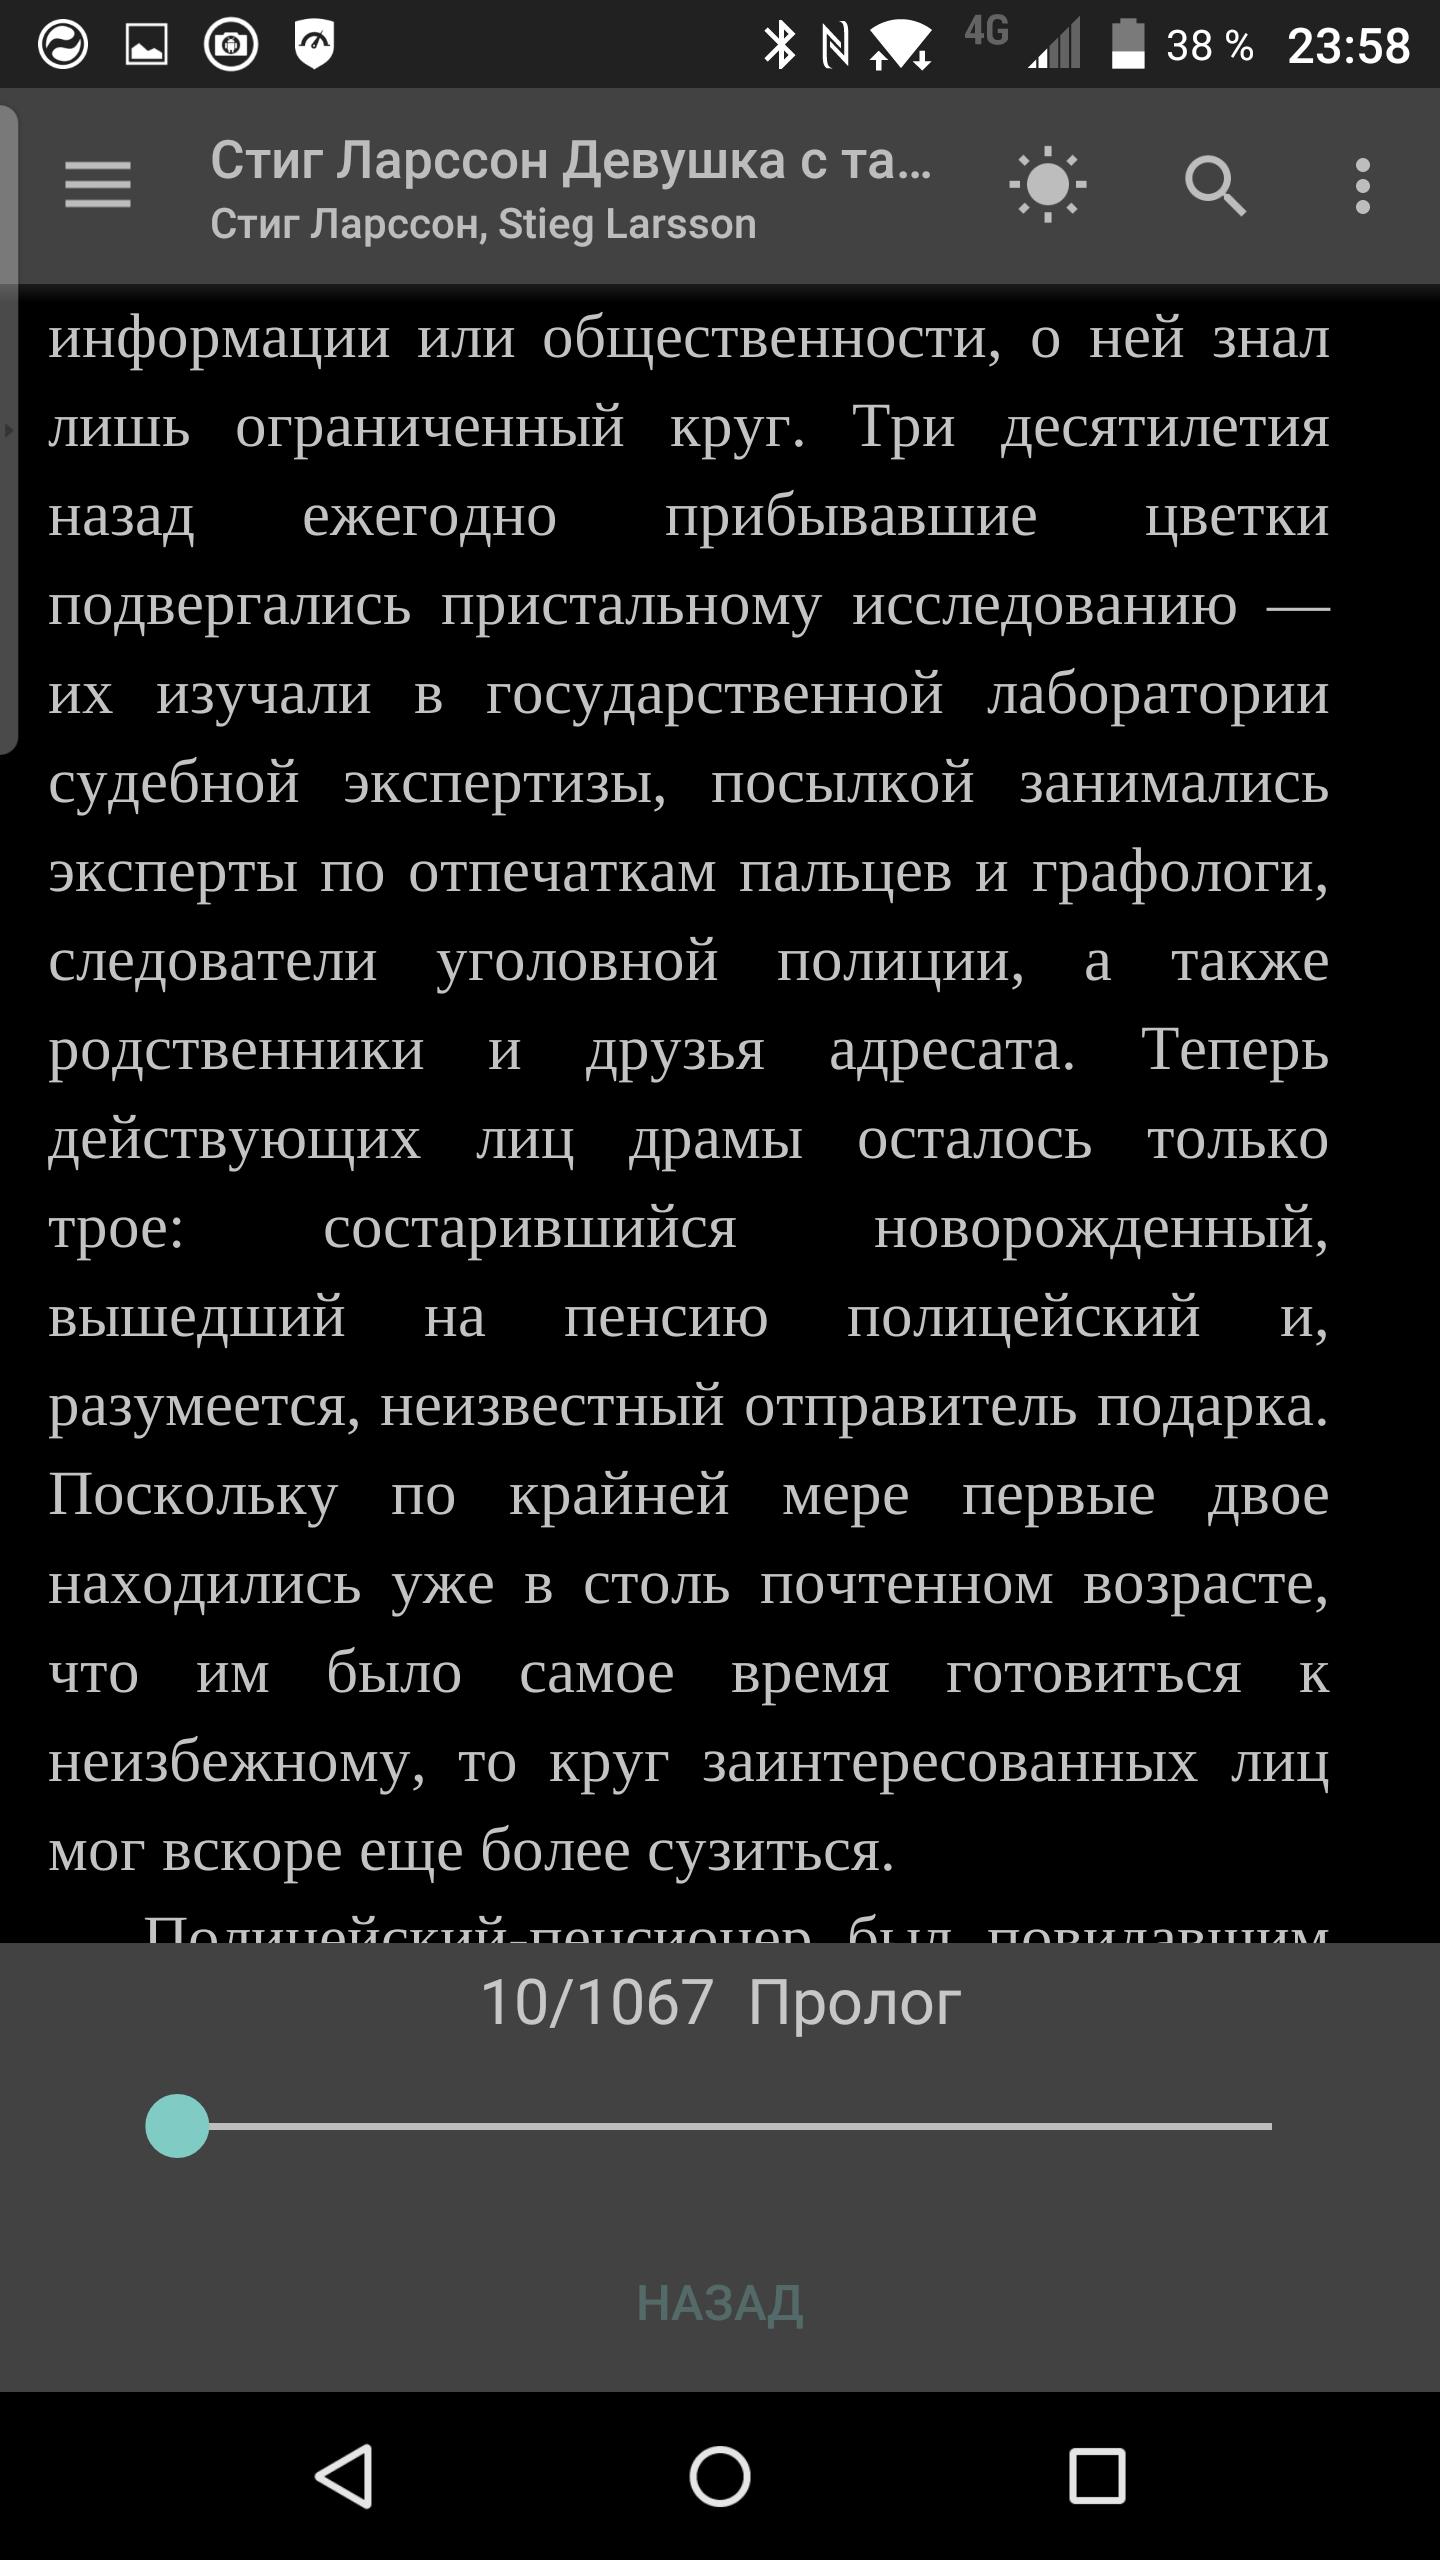 Screenshot_2016-01-23-23-58-45